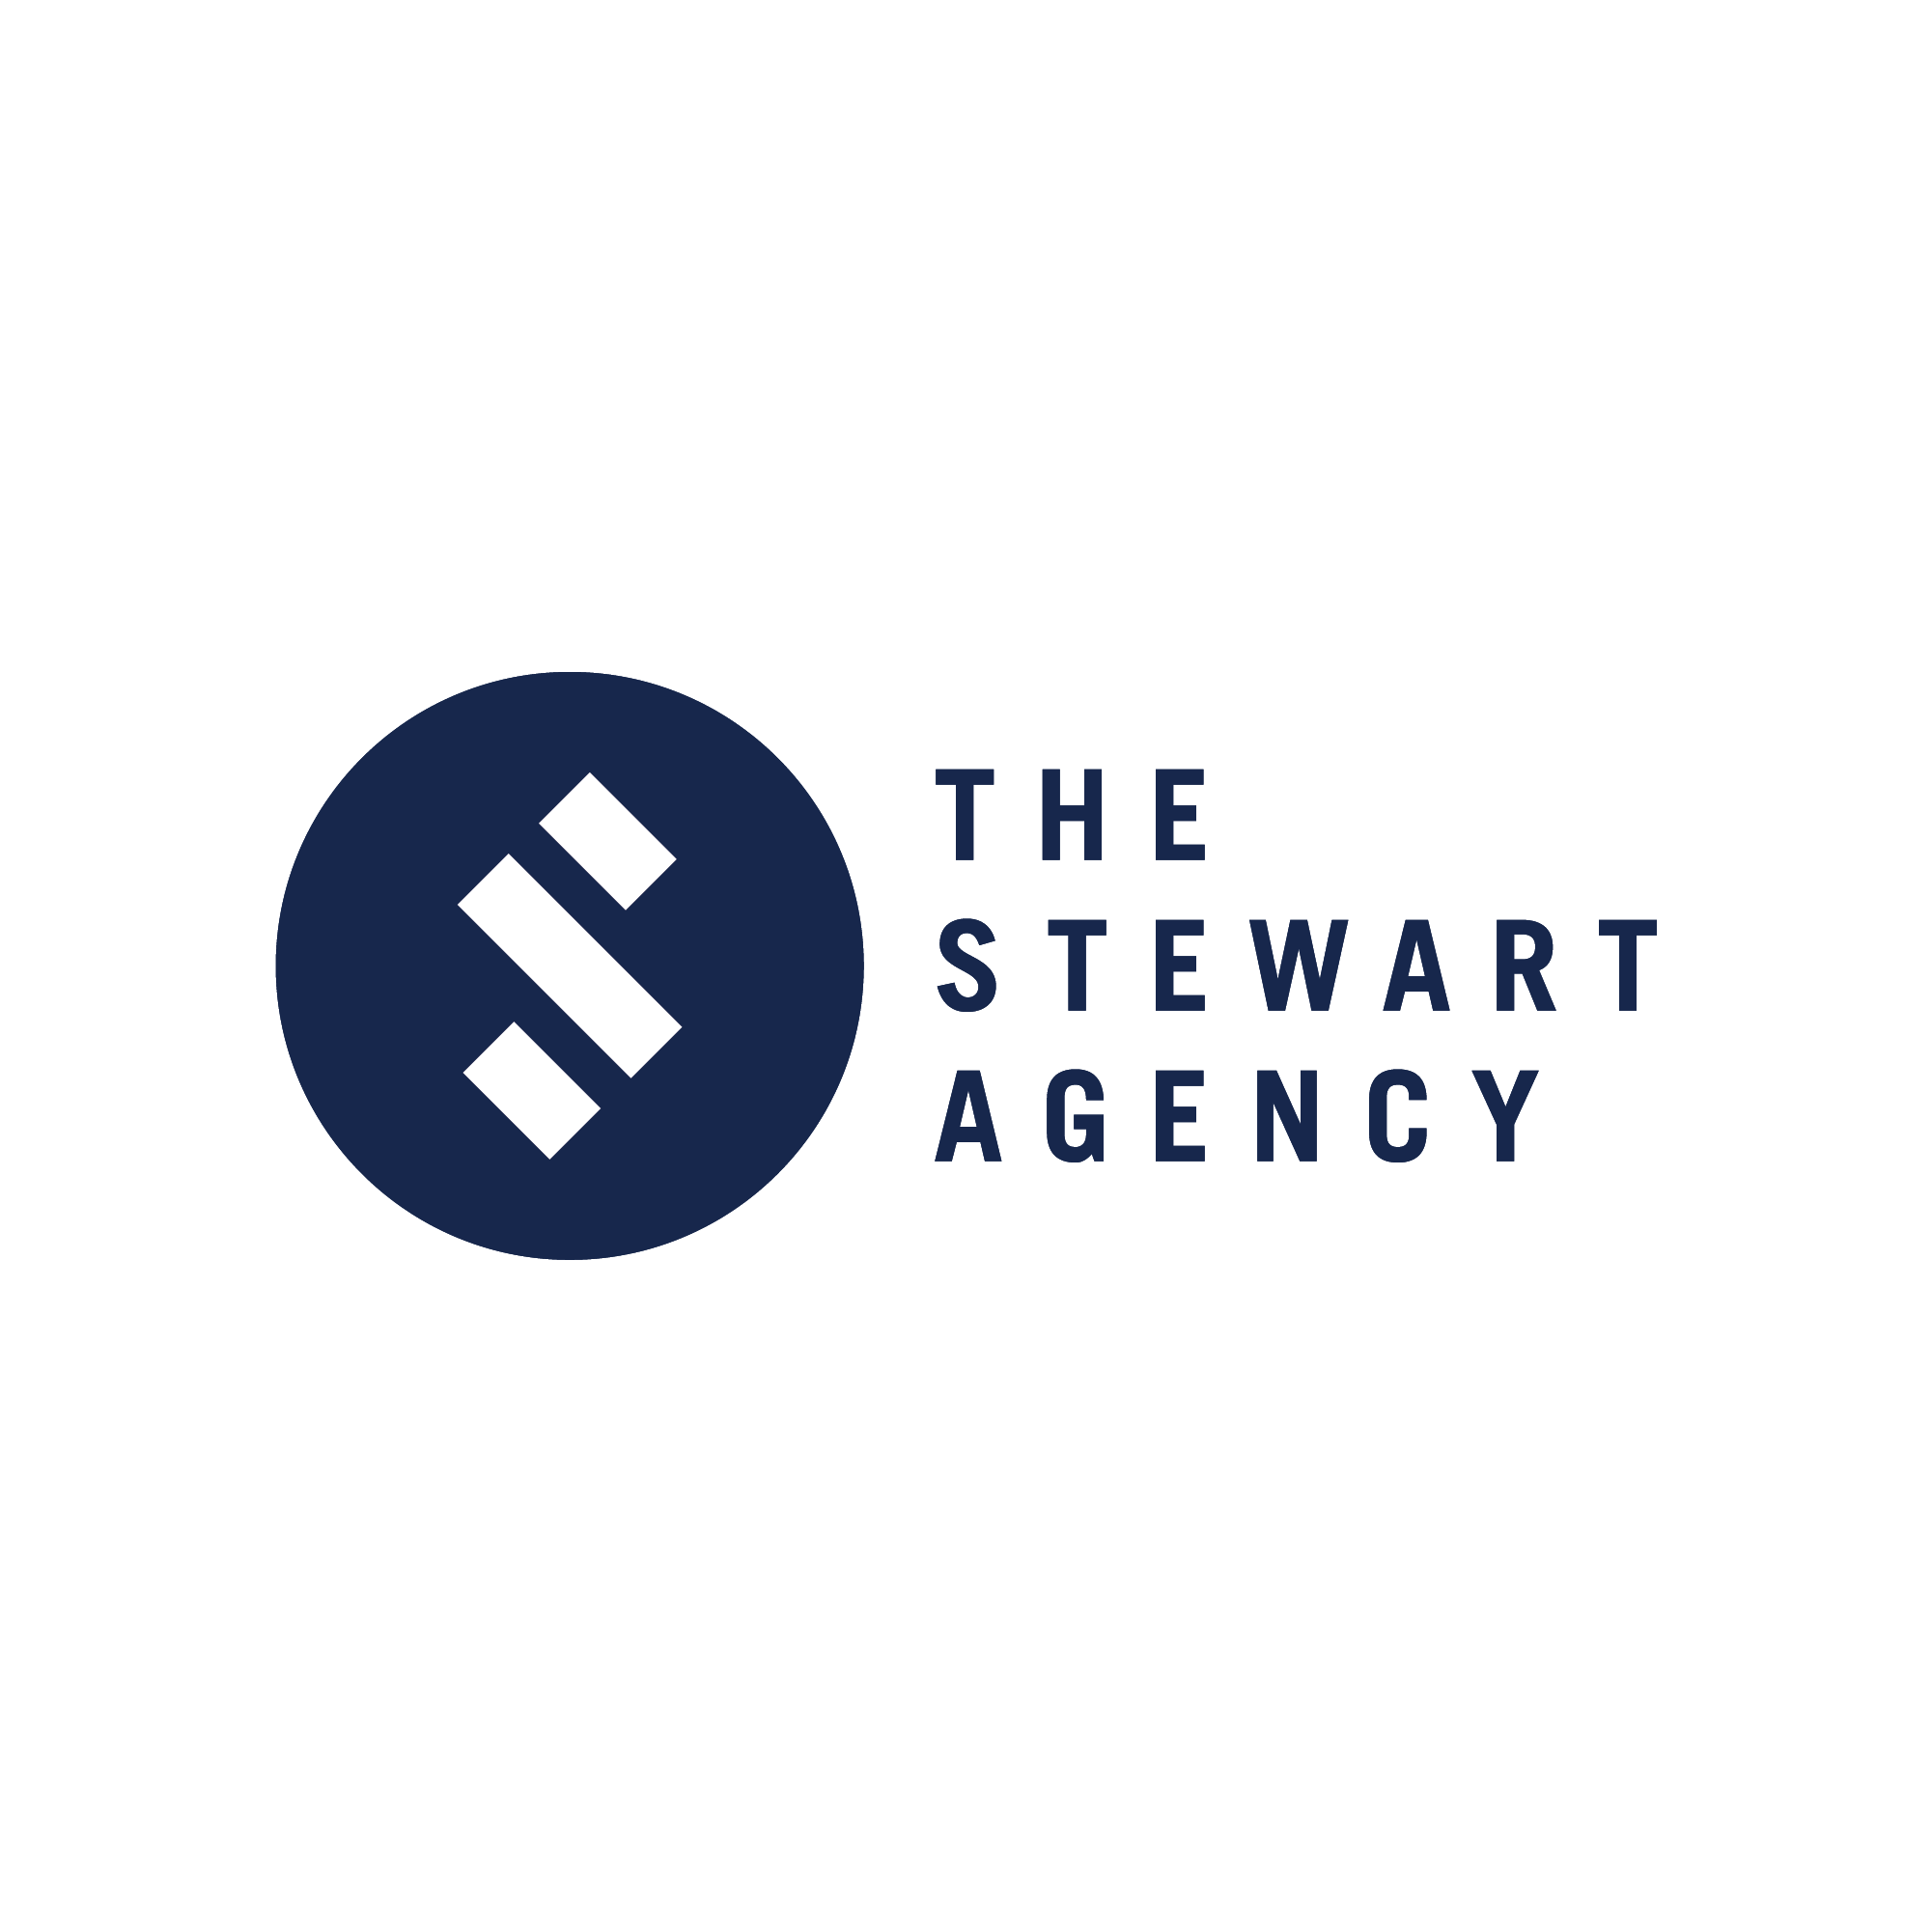 Finka_Studio_Logo_The_Stewart_Agency.png